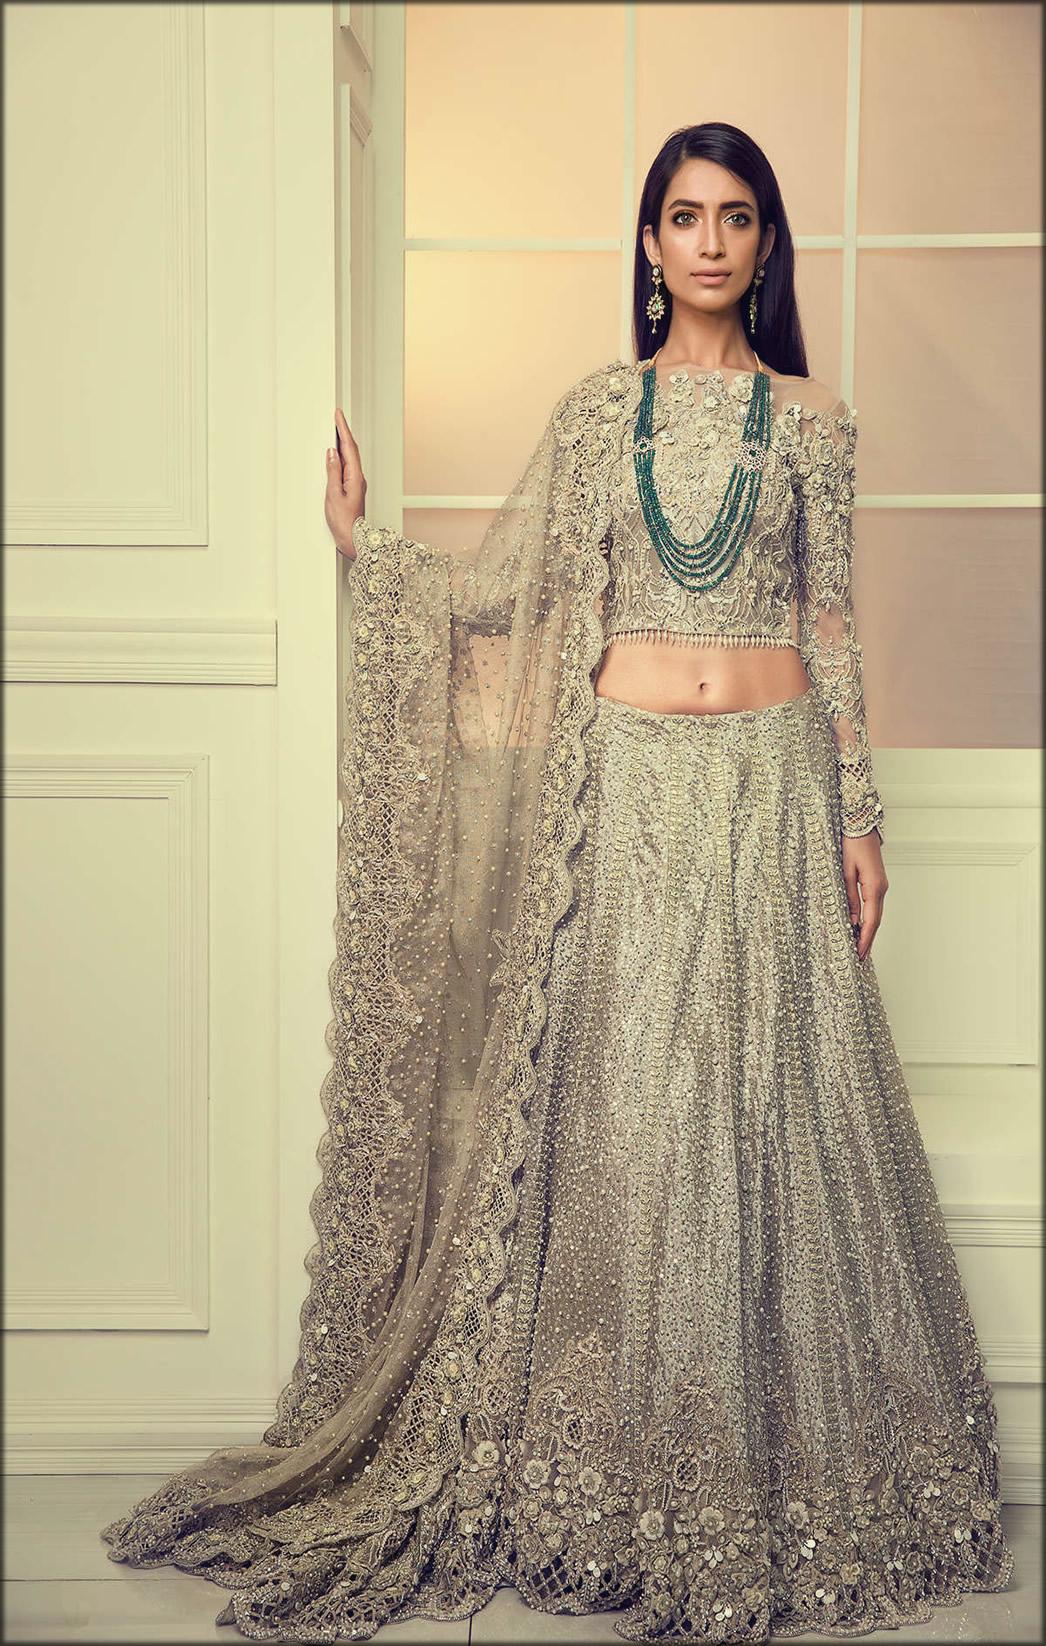 Akaroa Color Lehenga And Full Sleeves Blouse Bridal collection by Maria B